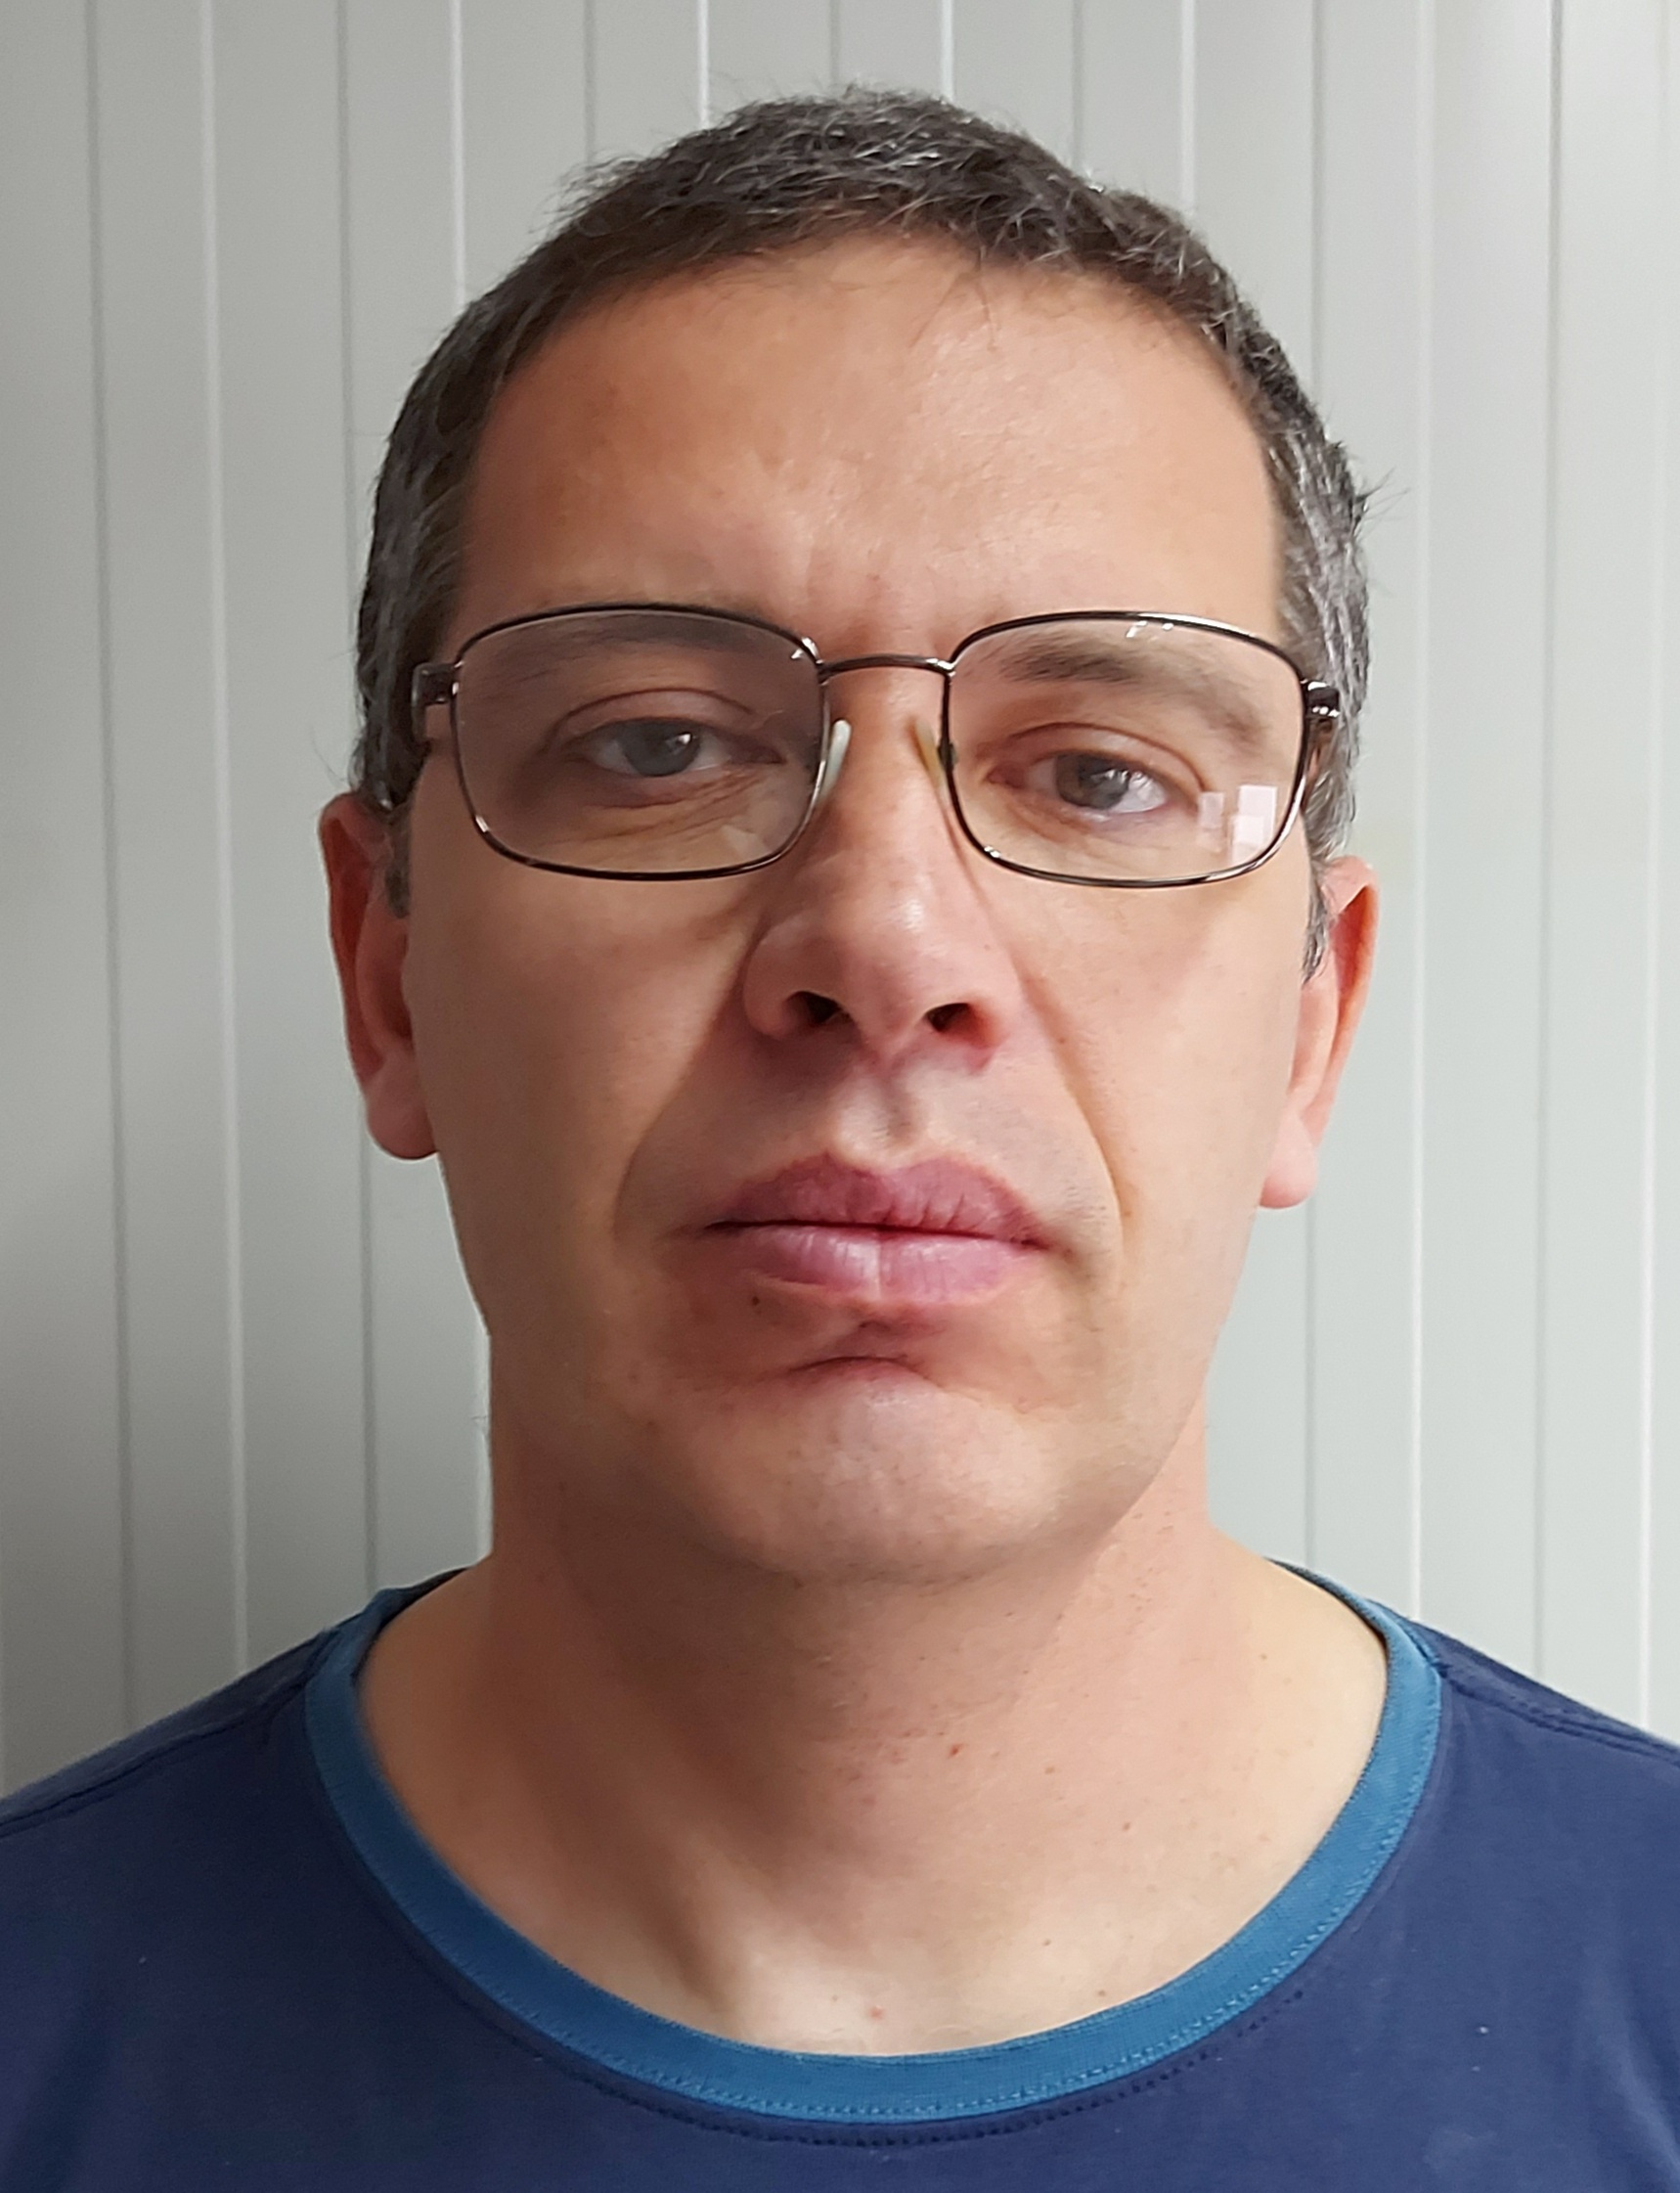 Христо Георгиев